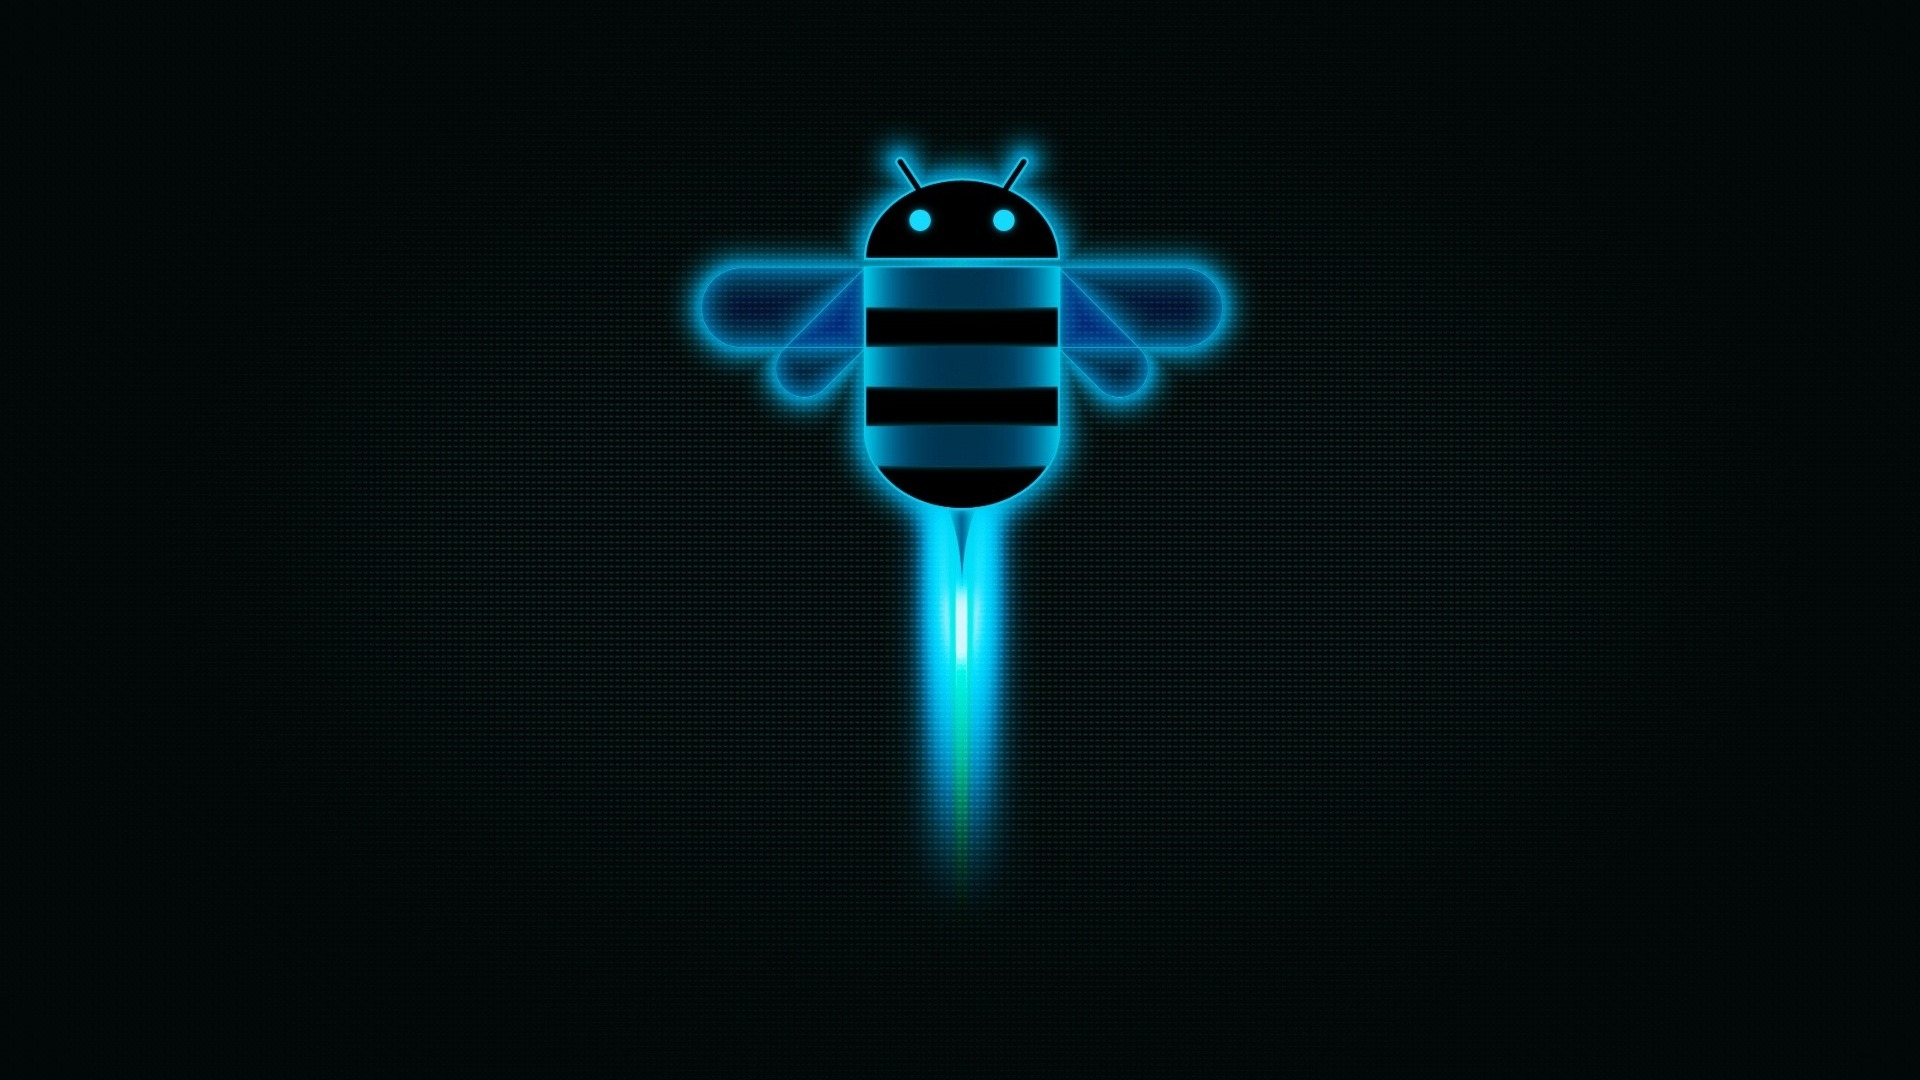 http://4.bp.blogspot.com/-2OQPGO8VsEY/UDDKvLAFpjI/AAAAAAAAHTQ/VfJR5FDQfA4/s0/honeycomb-android-1920x1080-wallpaper.jpg